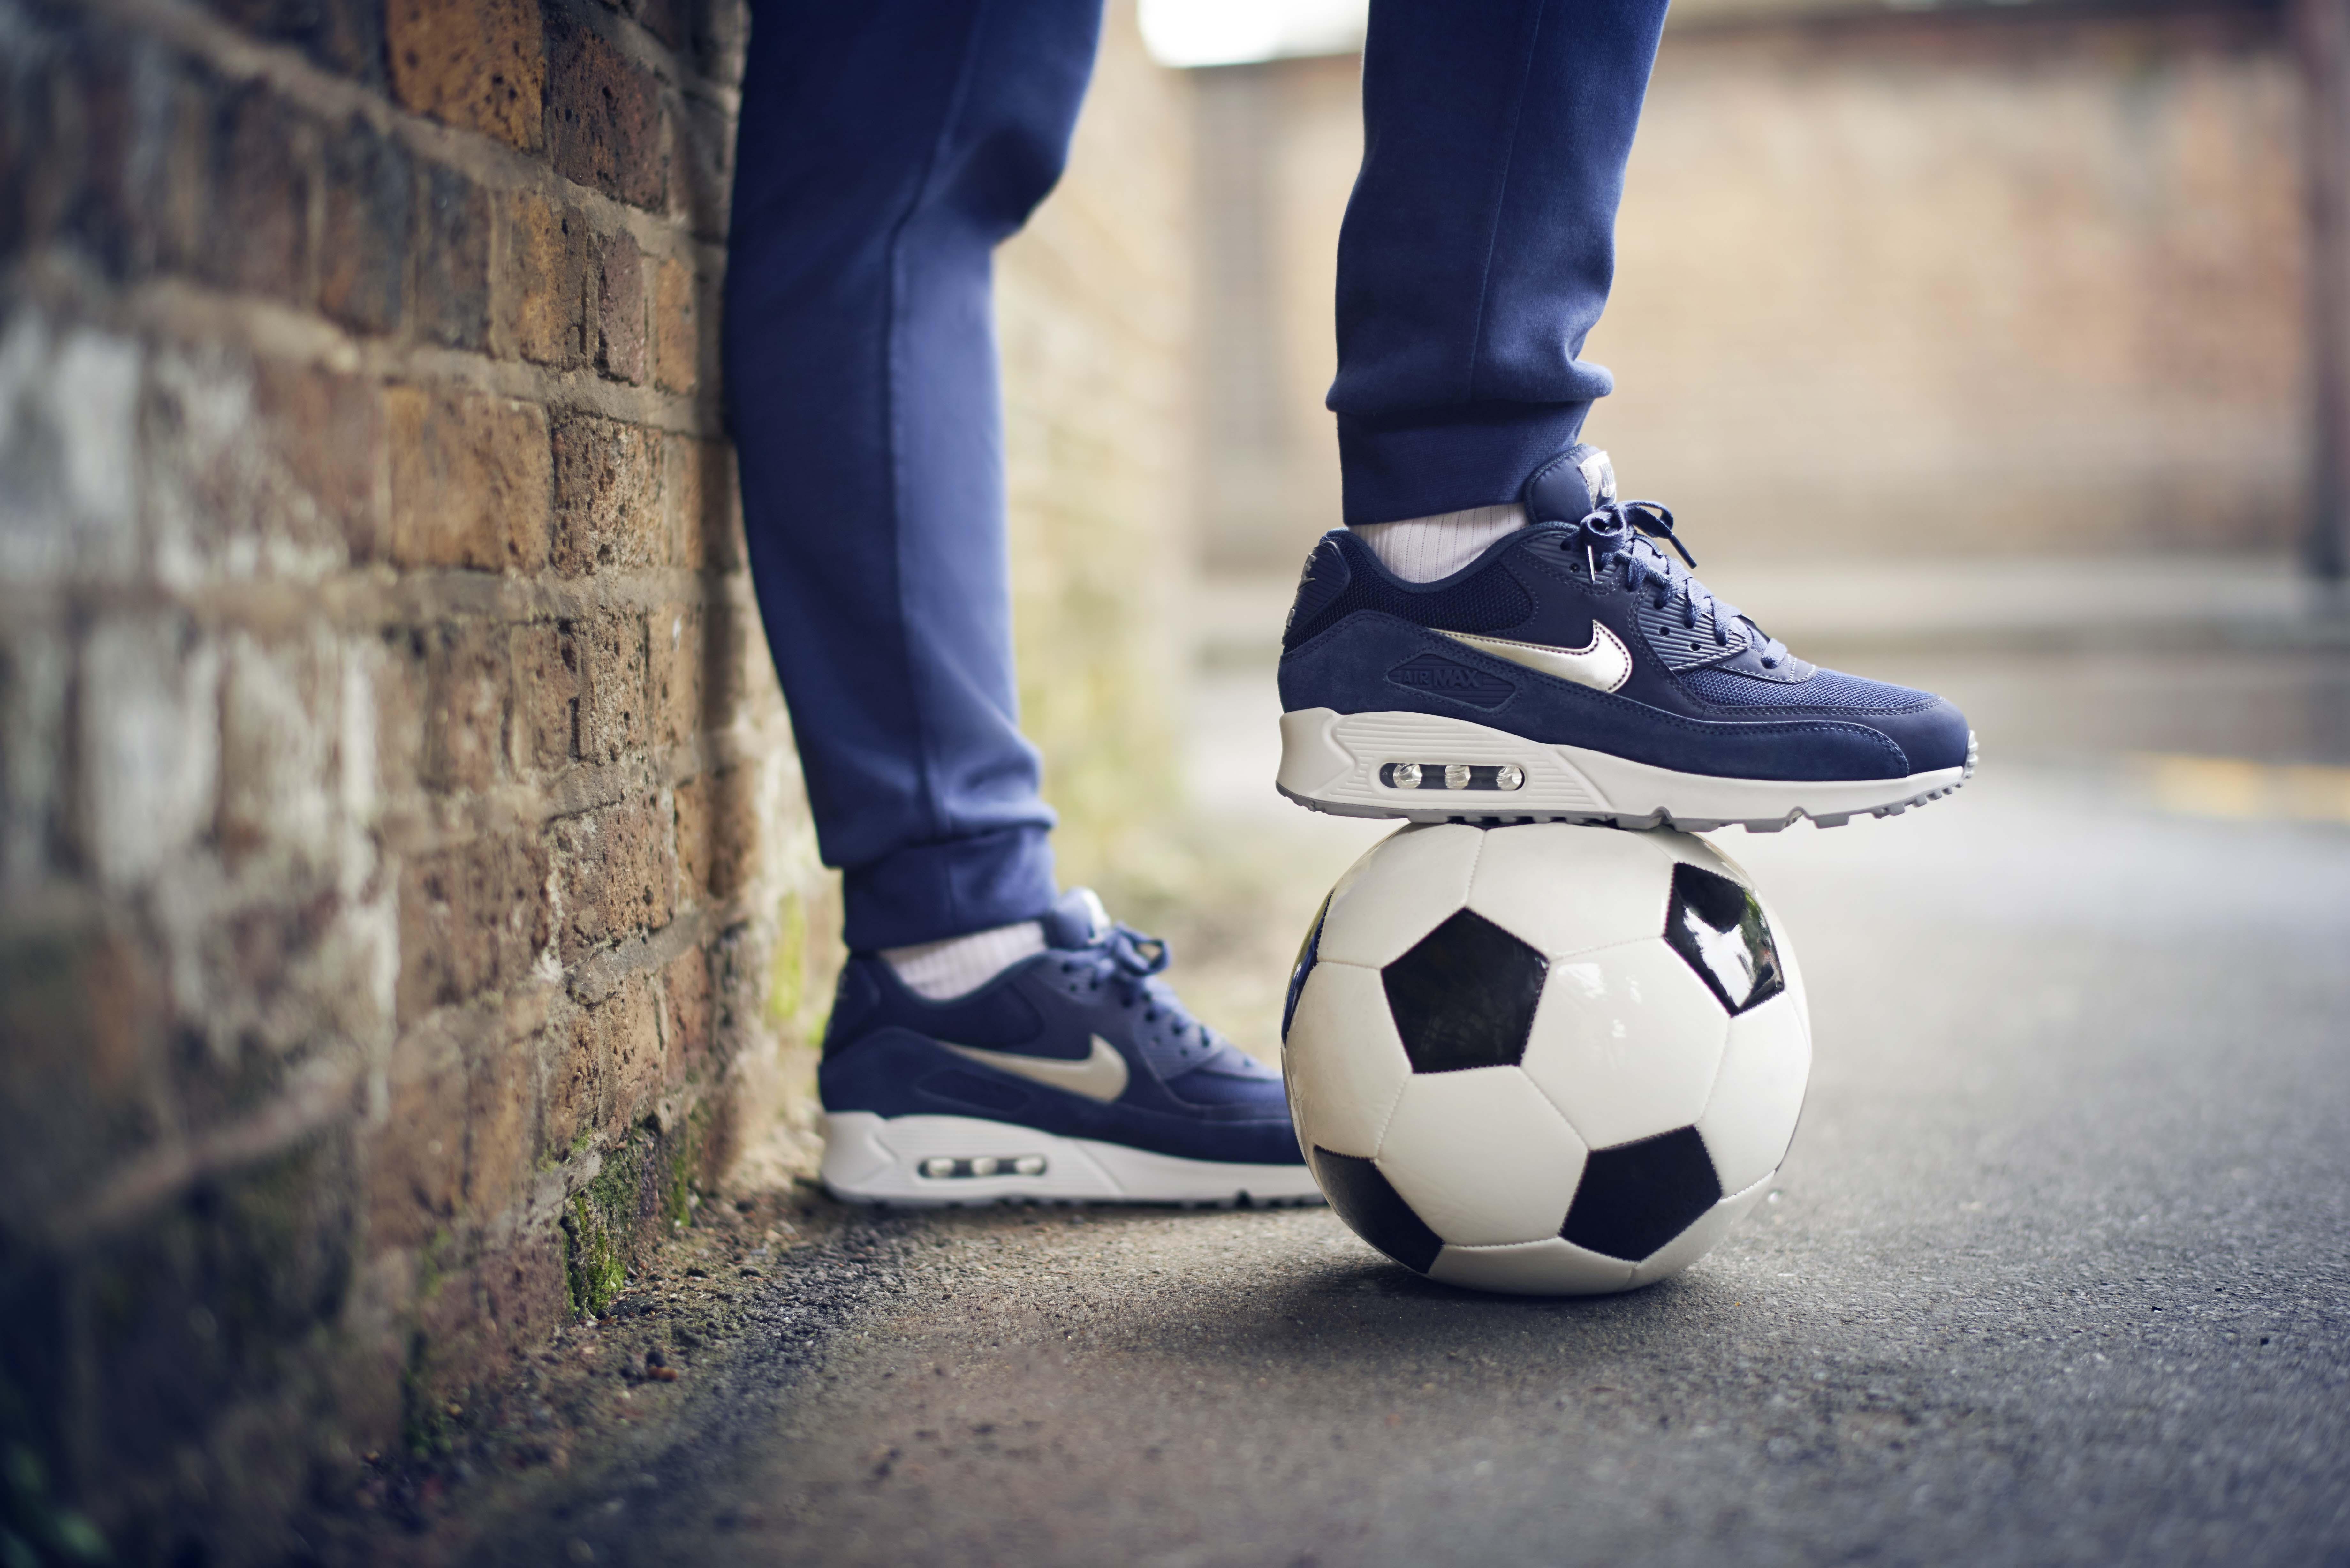 Lifestyle of Football